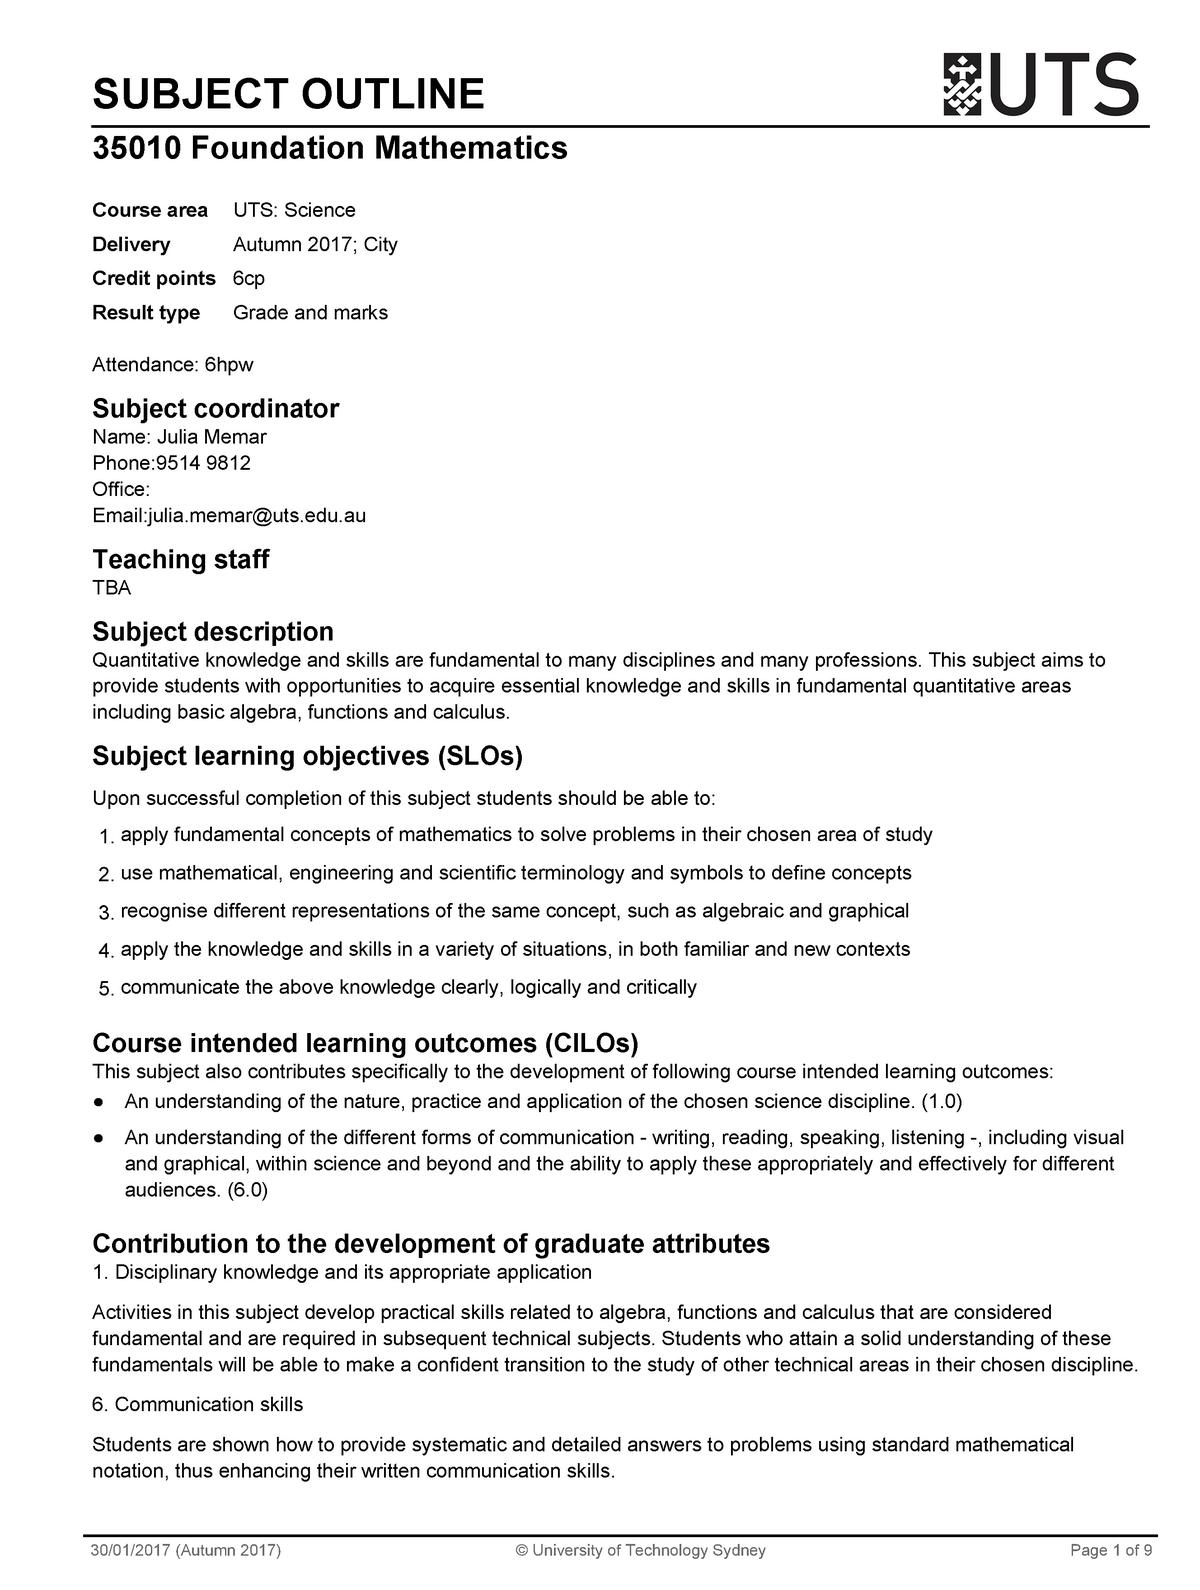 Sub outline math - 035010 : Foundation Mathematics - StuDocu